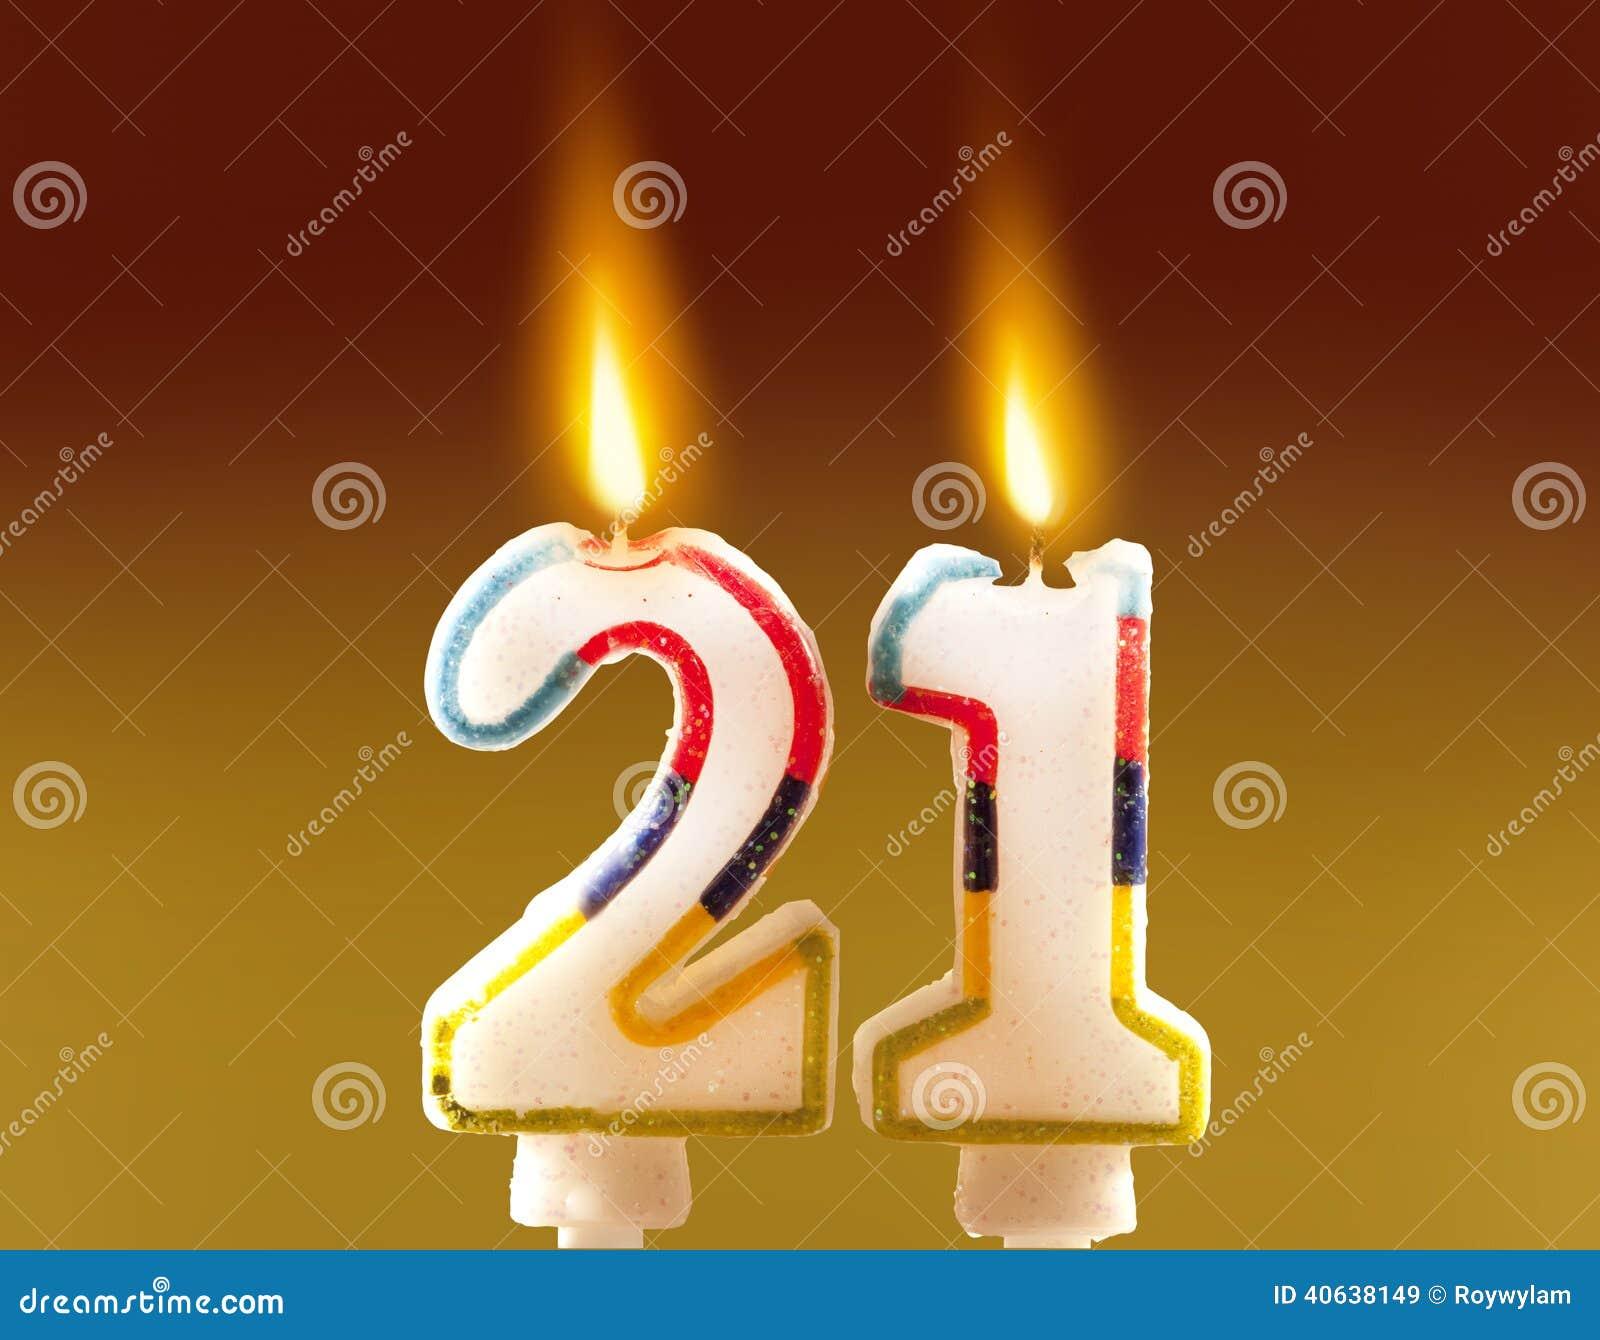 21st Birthday - Candles